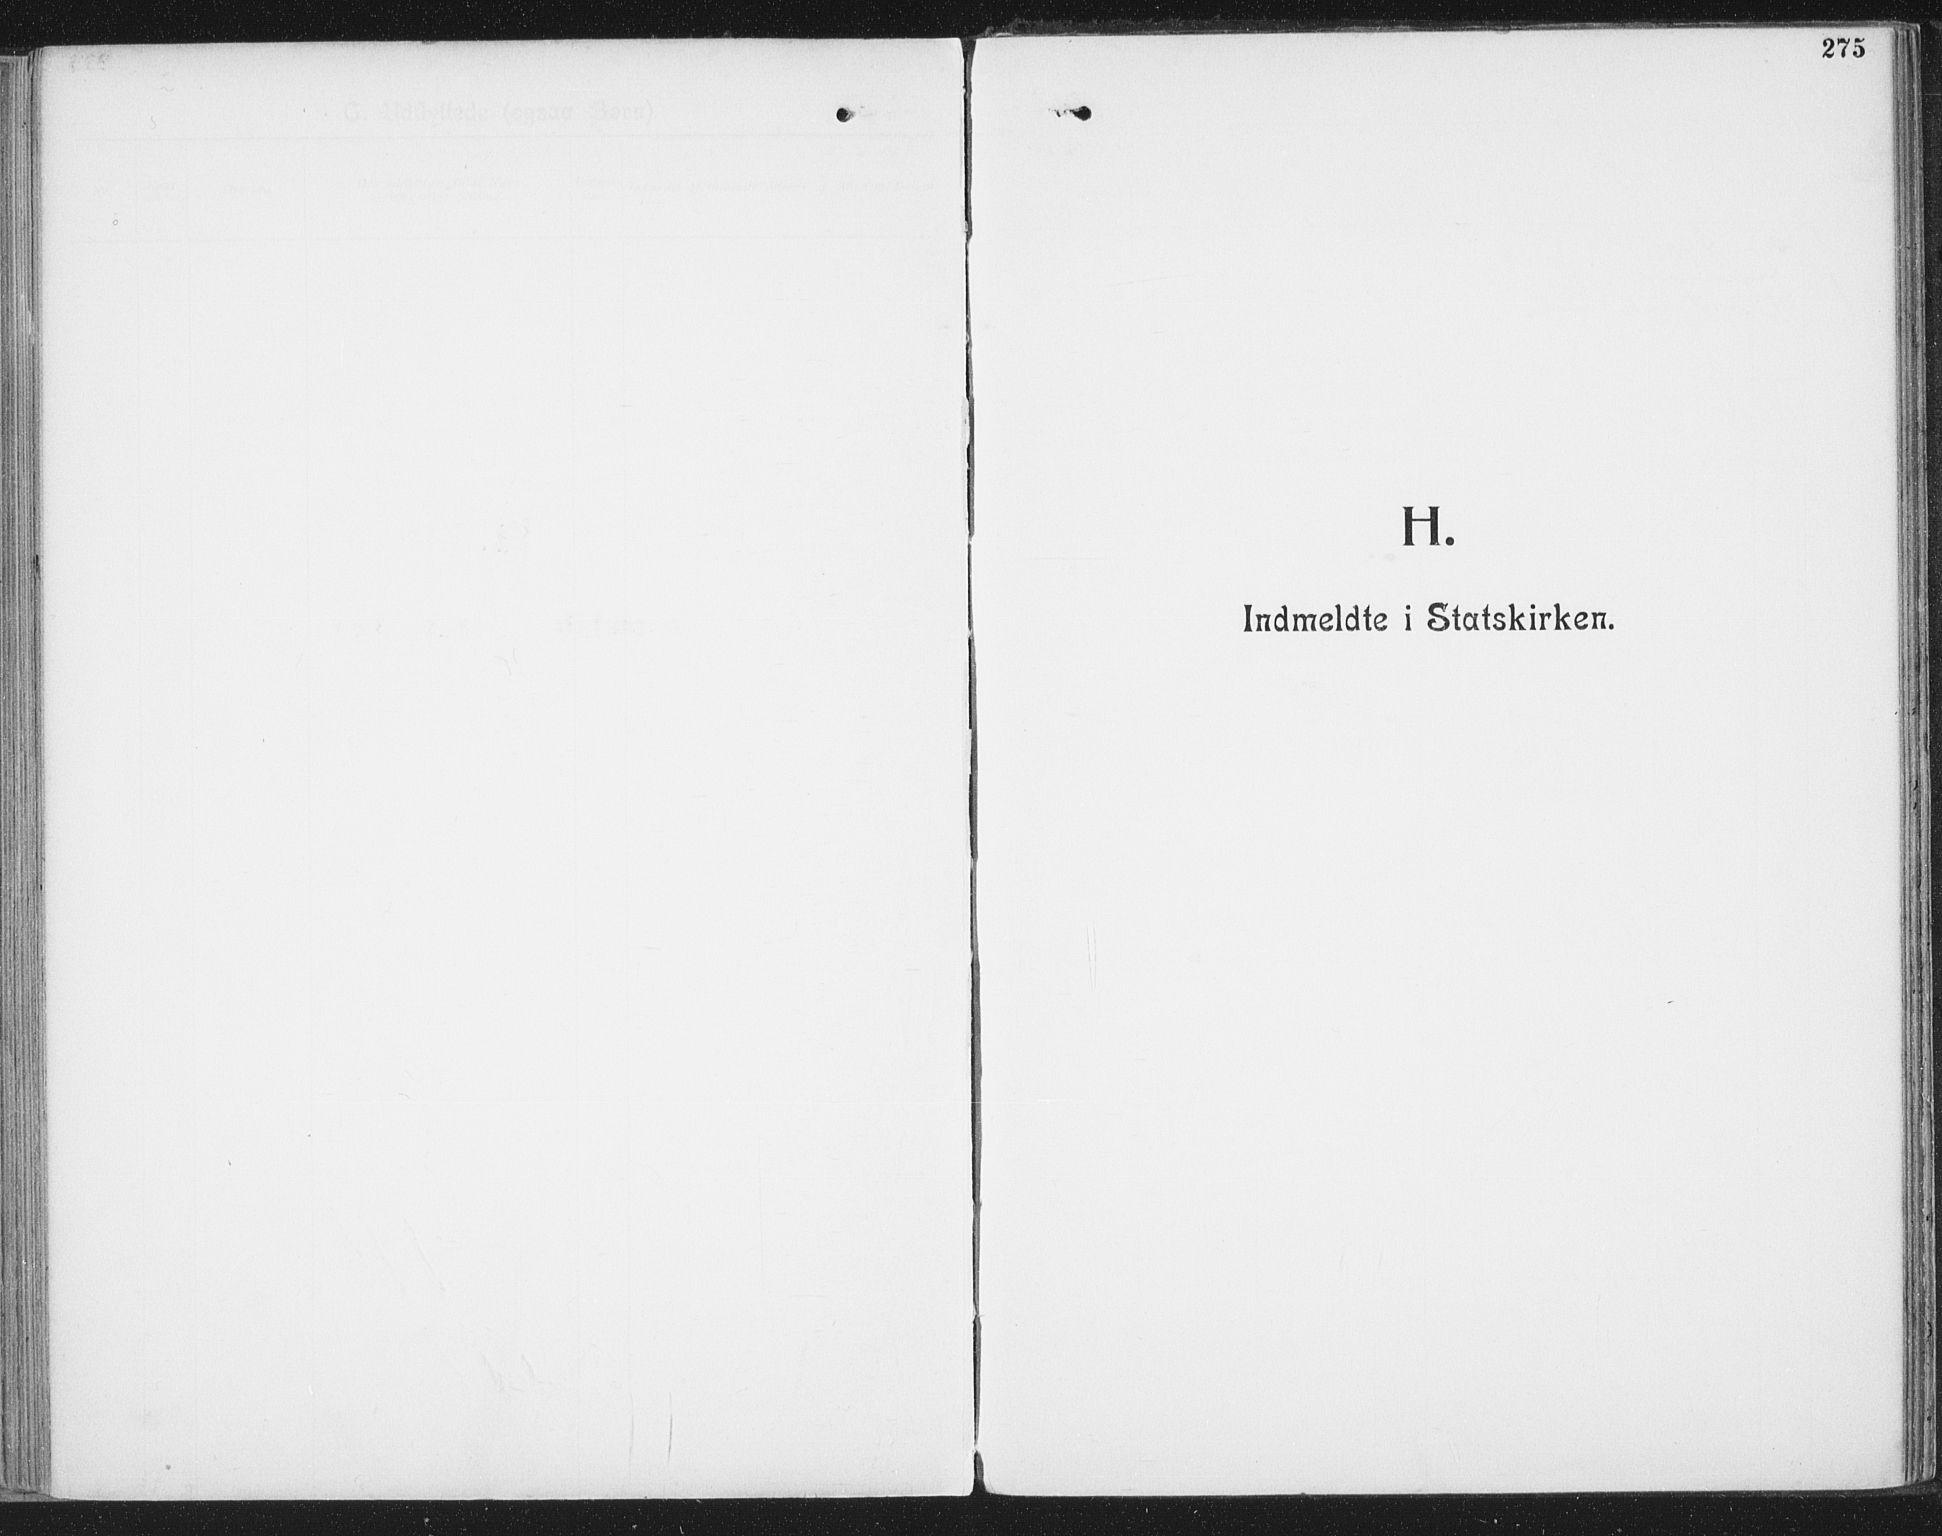 SAT, Ministerialprotokoller, klokkerbøker og fødselsregistre - Nordland, 804/L0081: Ministerialbok nr. 804A02, 1901-1915, s. 275